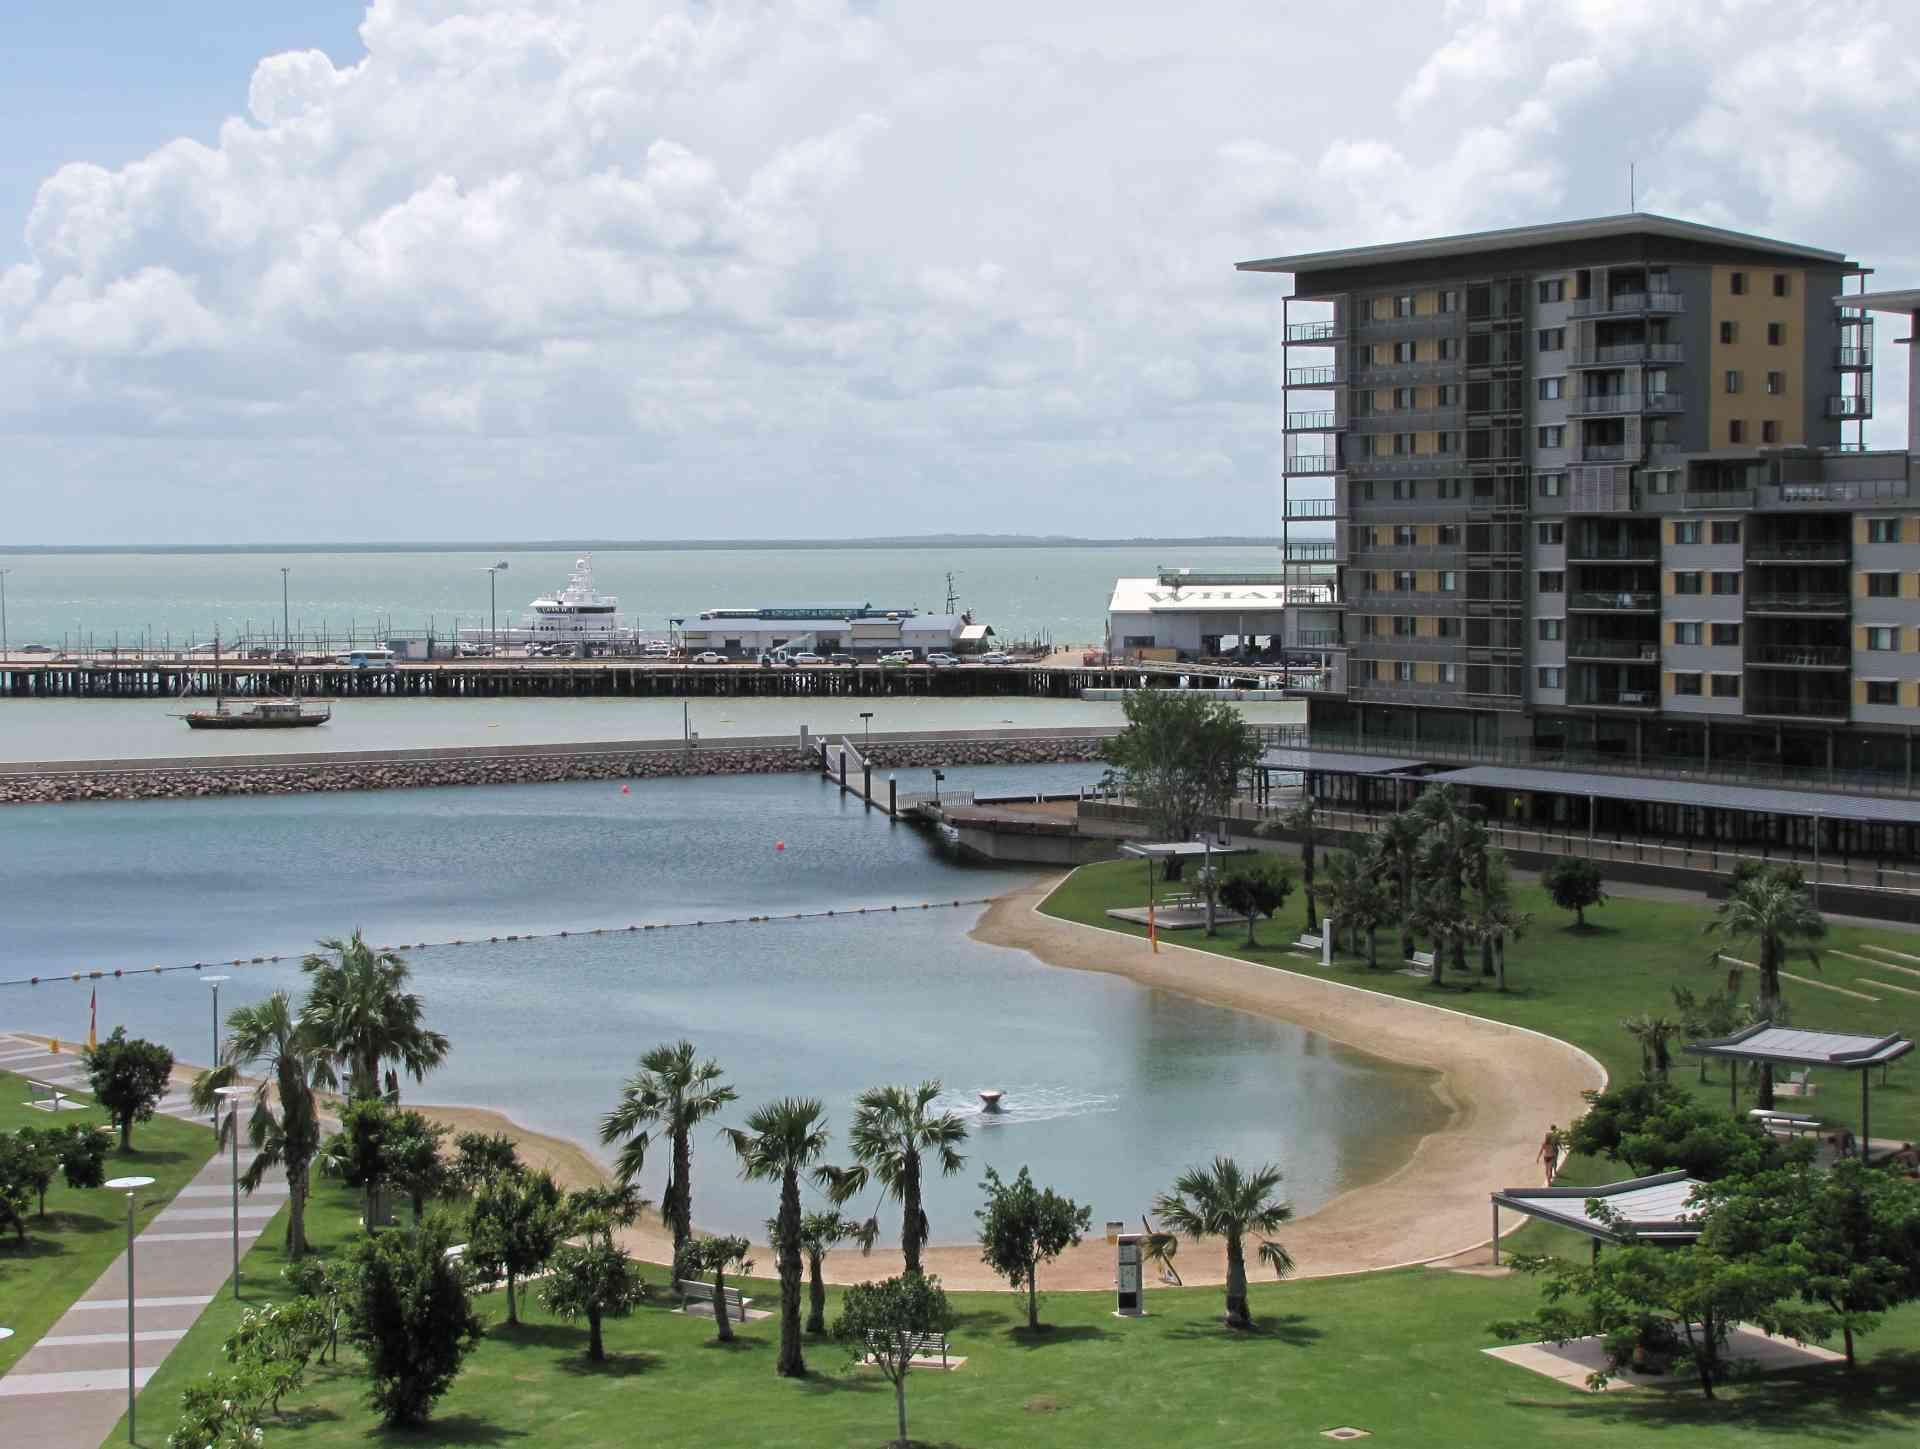 Darwin, the tropical capital